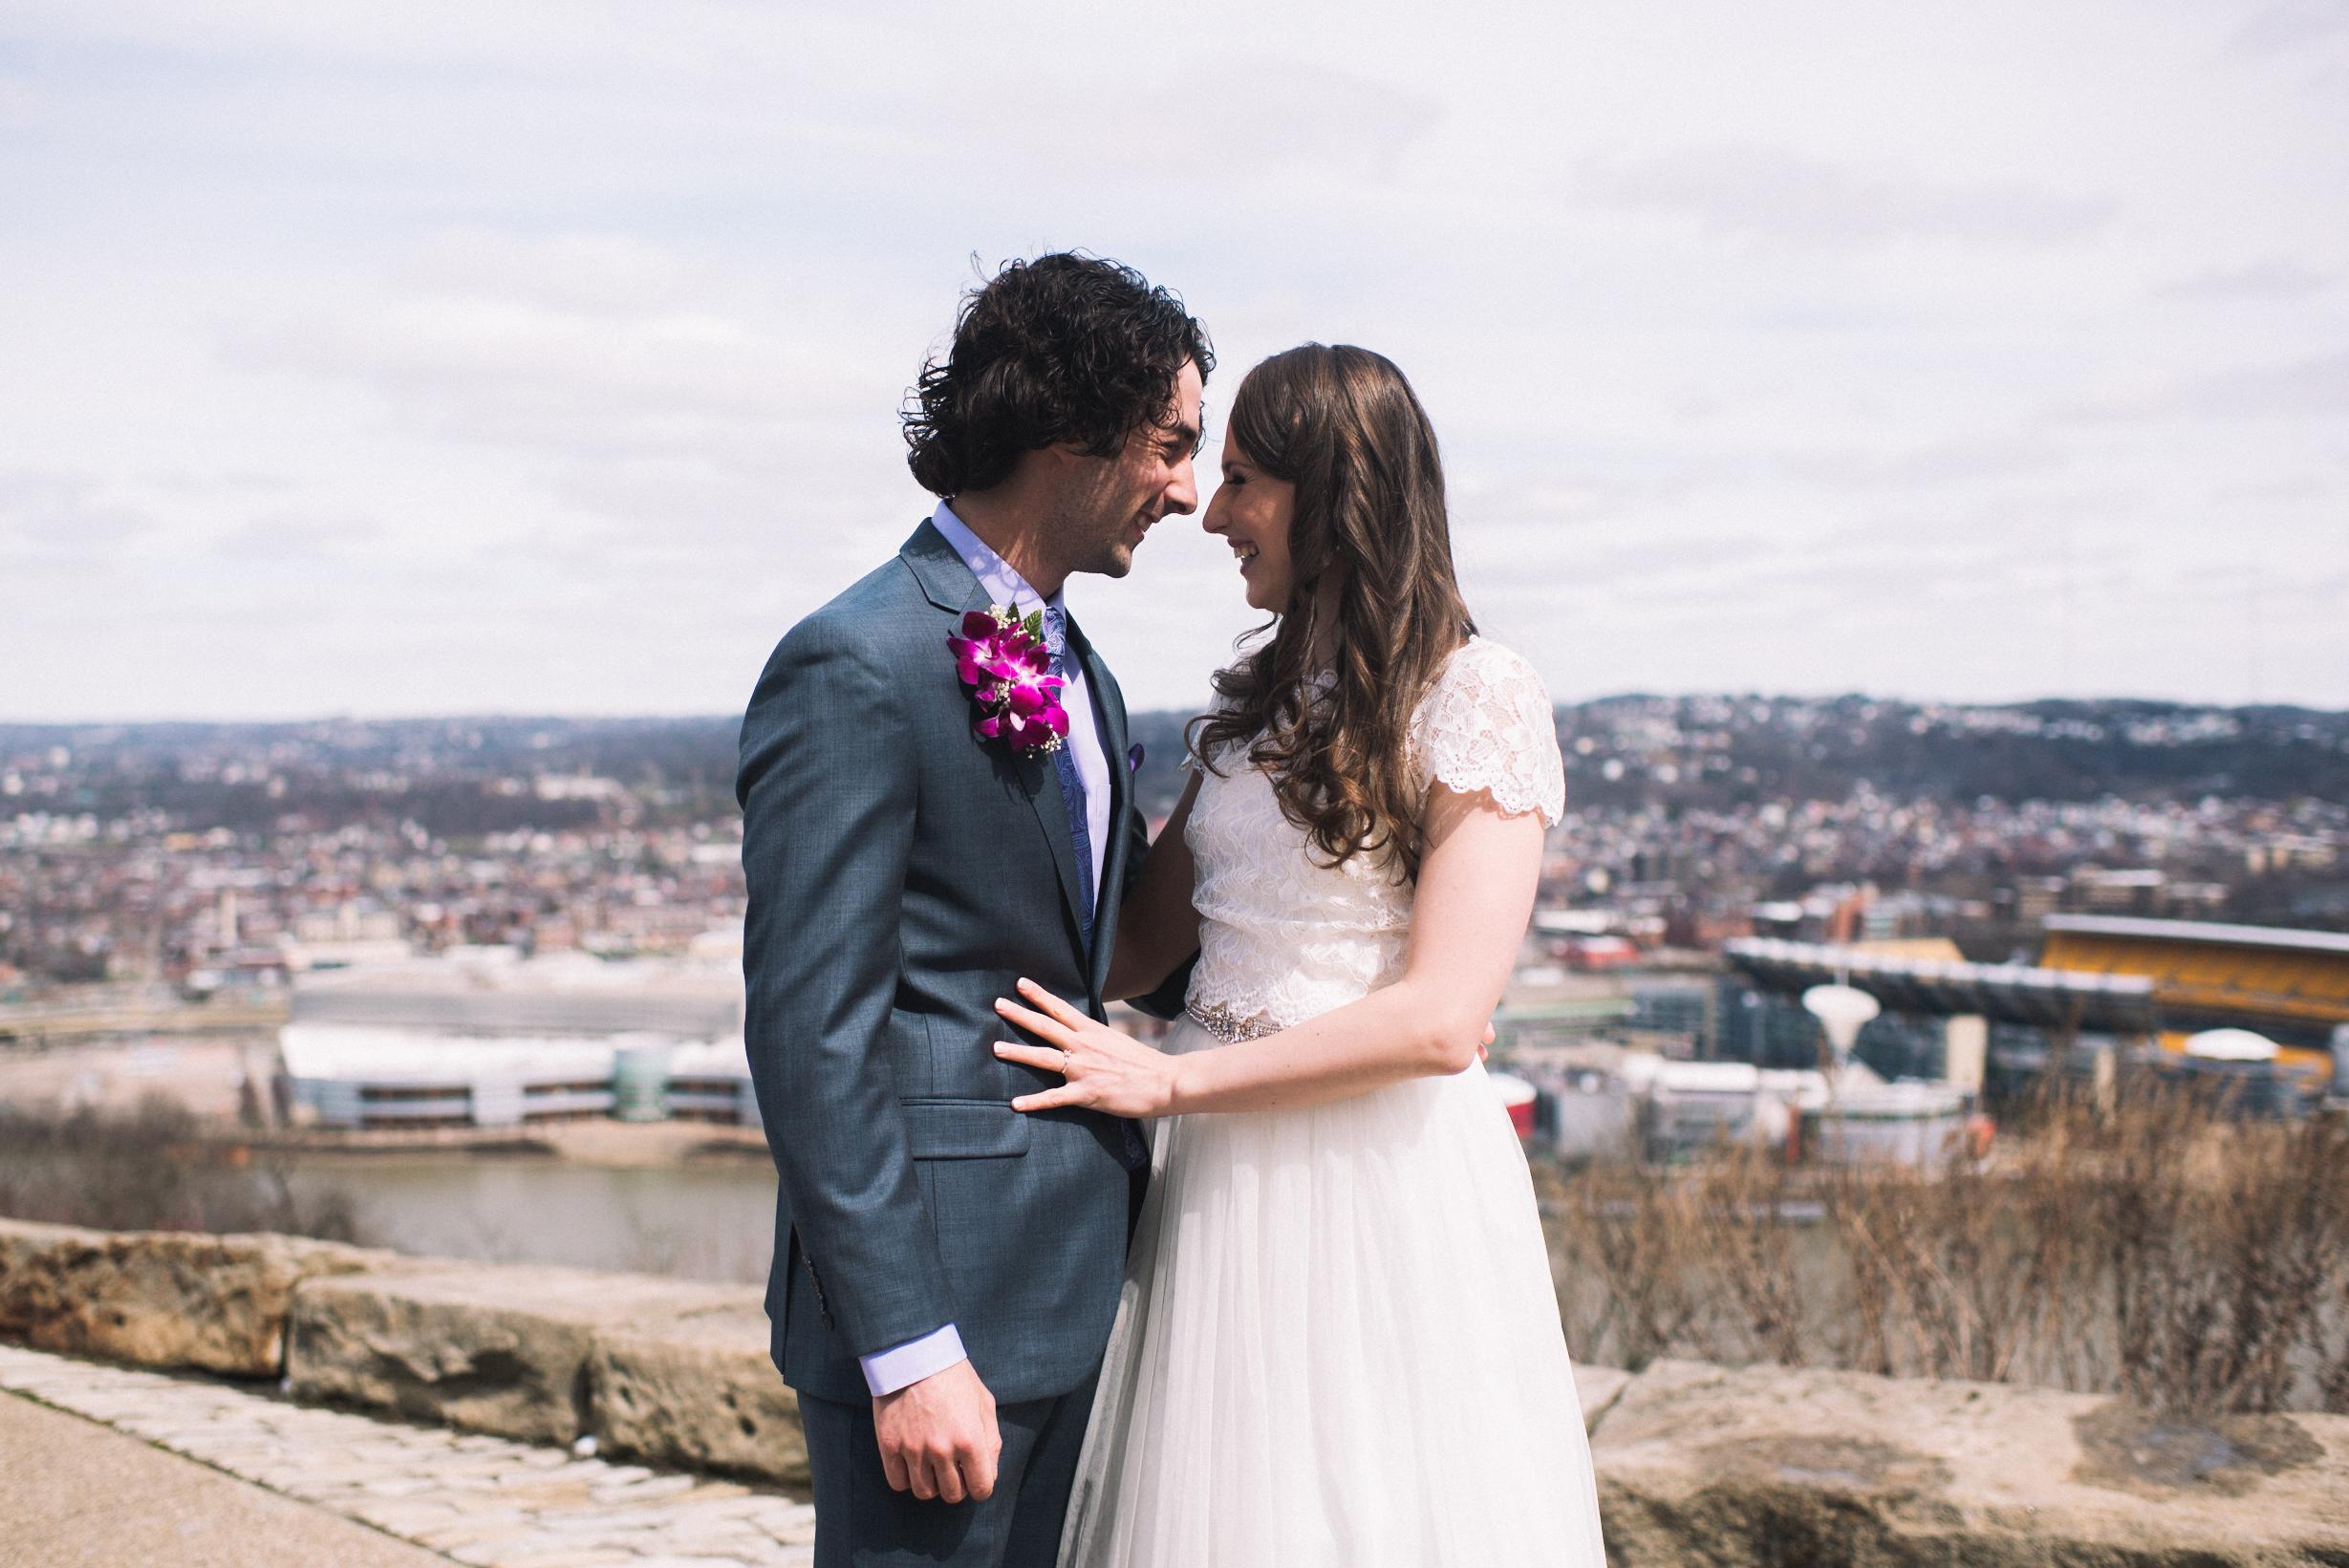 Pittsburgh Elopement Wedding Photographer - Carnegie Museum - Olya Tyler141.jpg